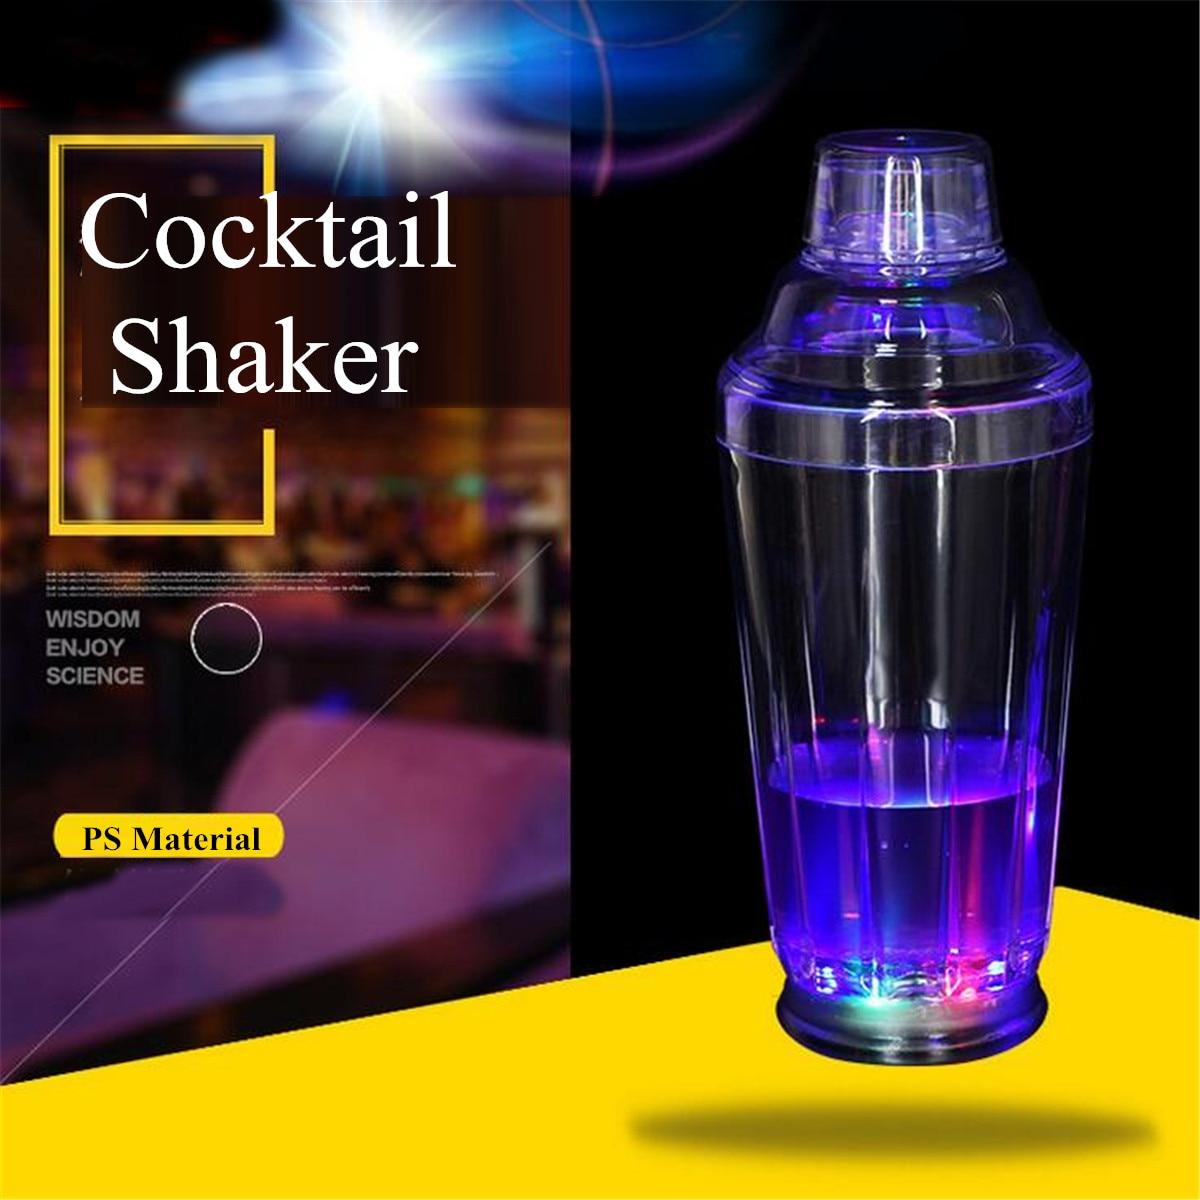 1pcs Light Up Led Cocktail Shakers Bar Tools Barware Home Party Supplies Cocktail Shaker Maker Mixer Muddler Bar Strainer Kitchen,dining & Bar Barware